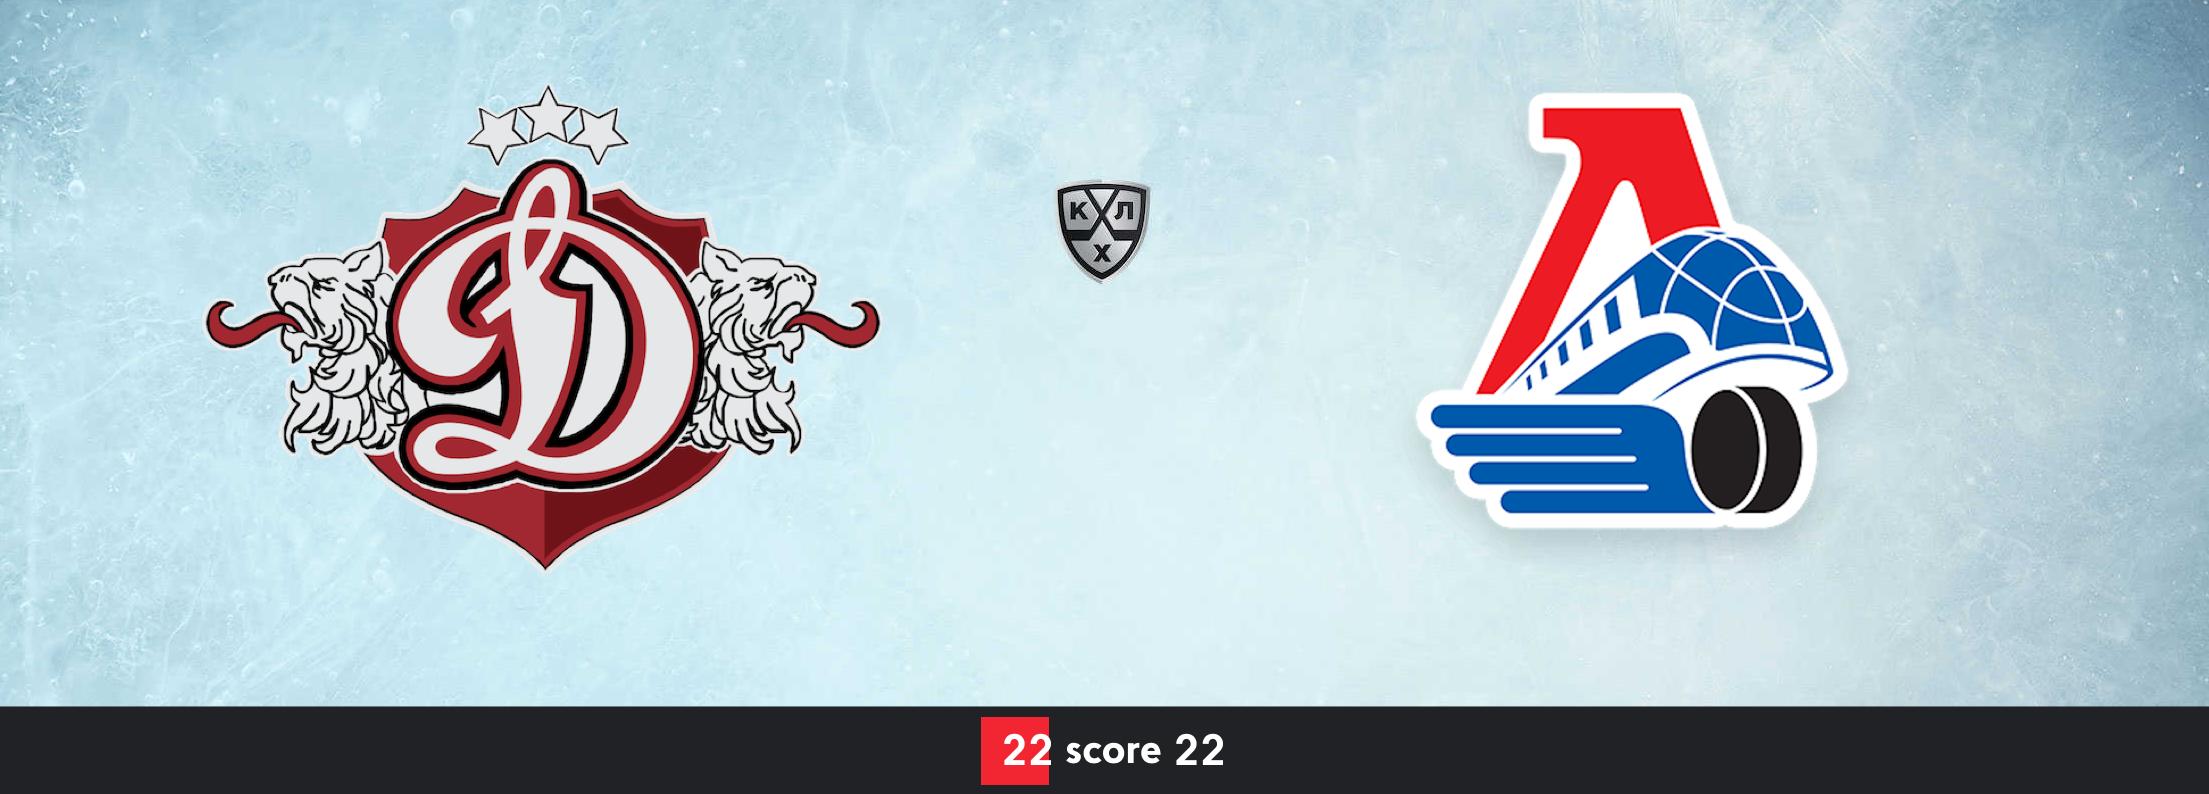 Хоккей  КХЛ. Динамо Рига — Локомотив Ярославль 09.01.2021